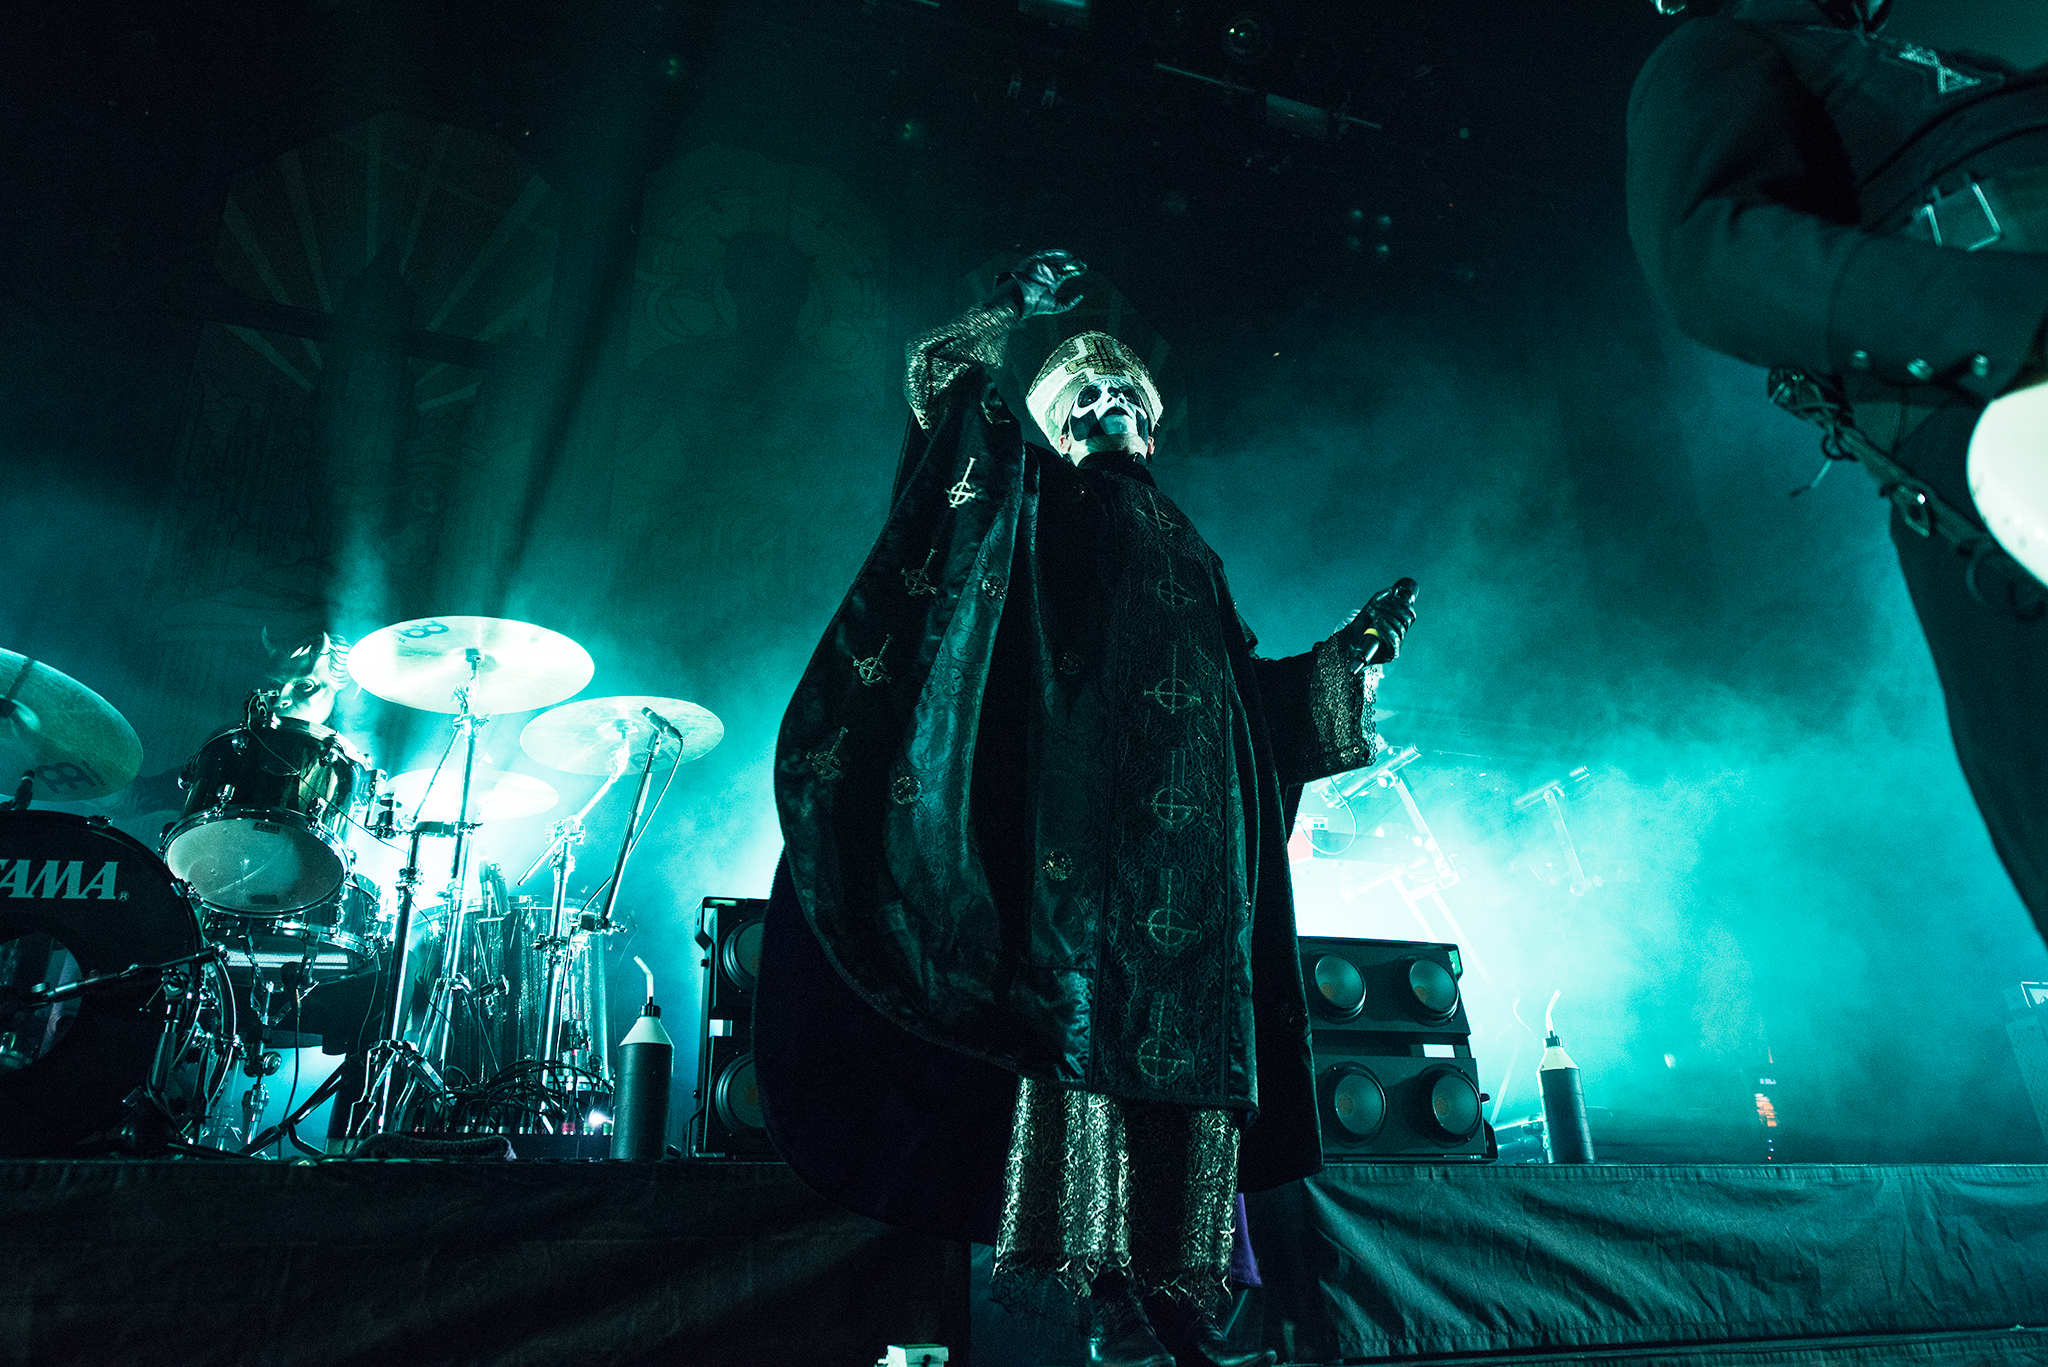 Ghost-Emos-Concert-Photography-Katrina-Barber-2.jpg